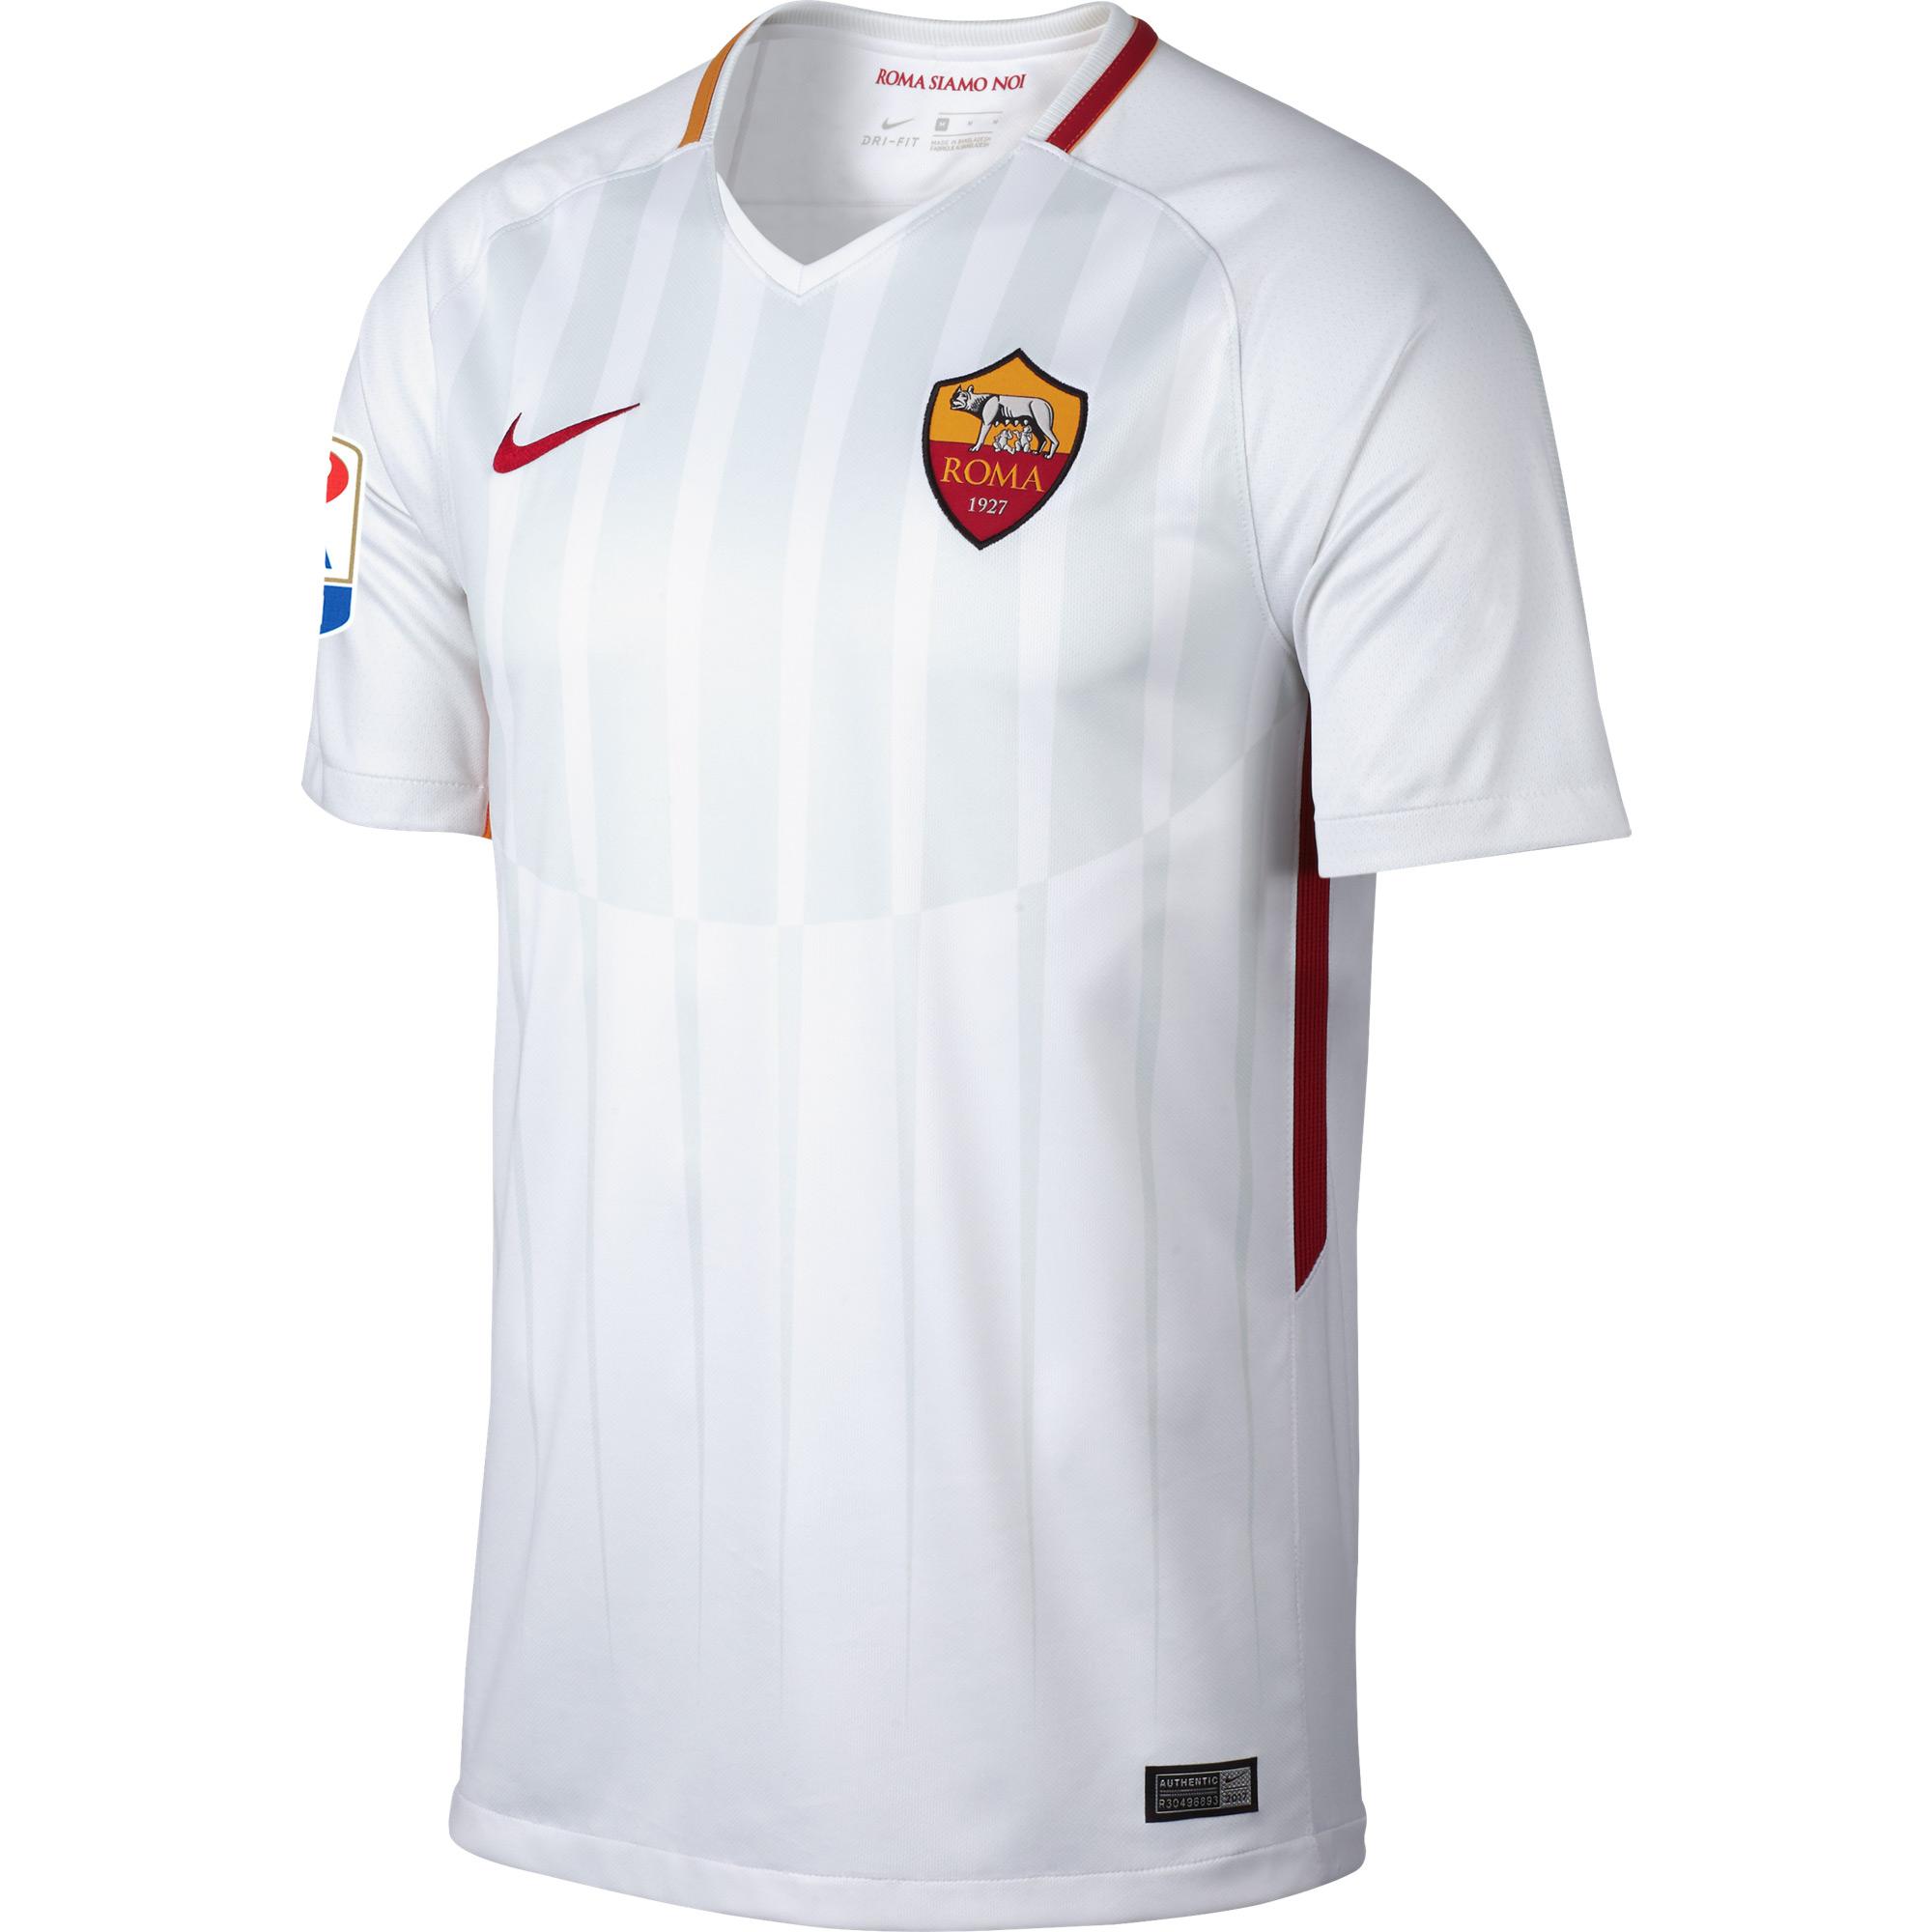 AS Roma Away Shirt 2017 2018 inc Serie A Patch - XL